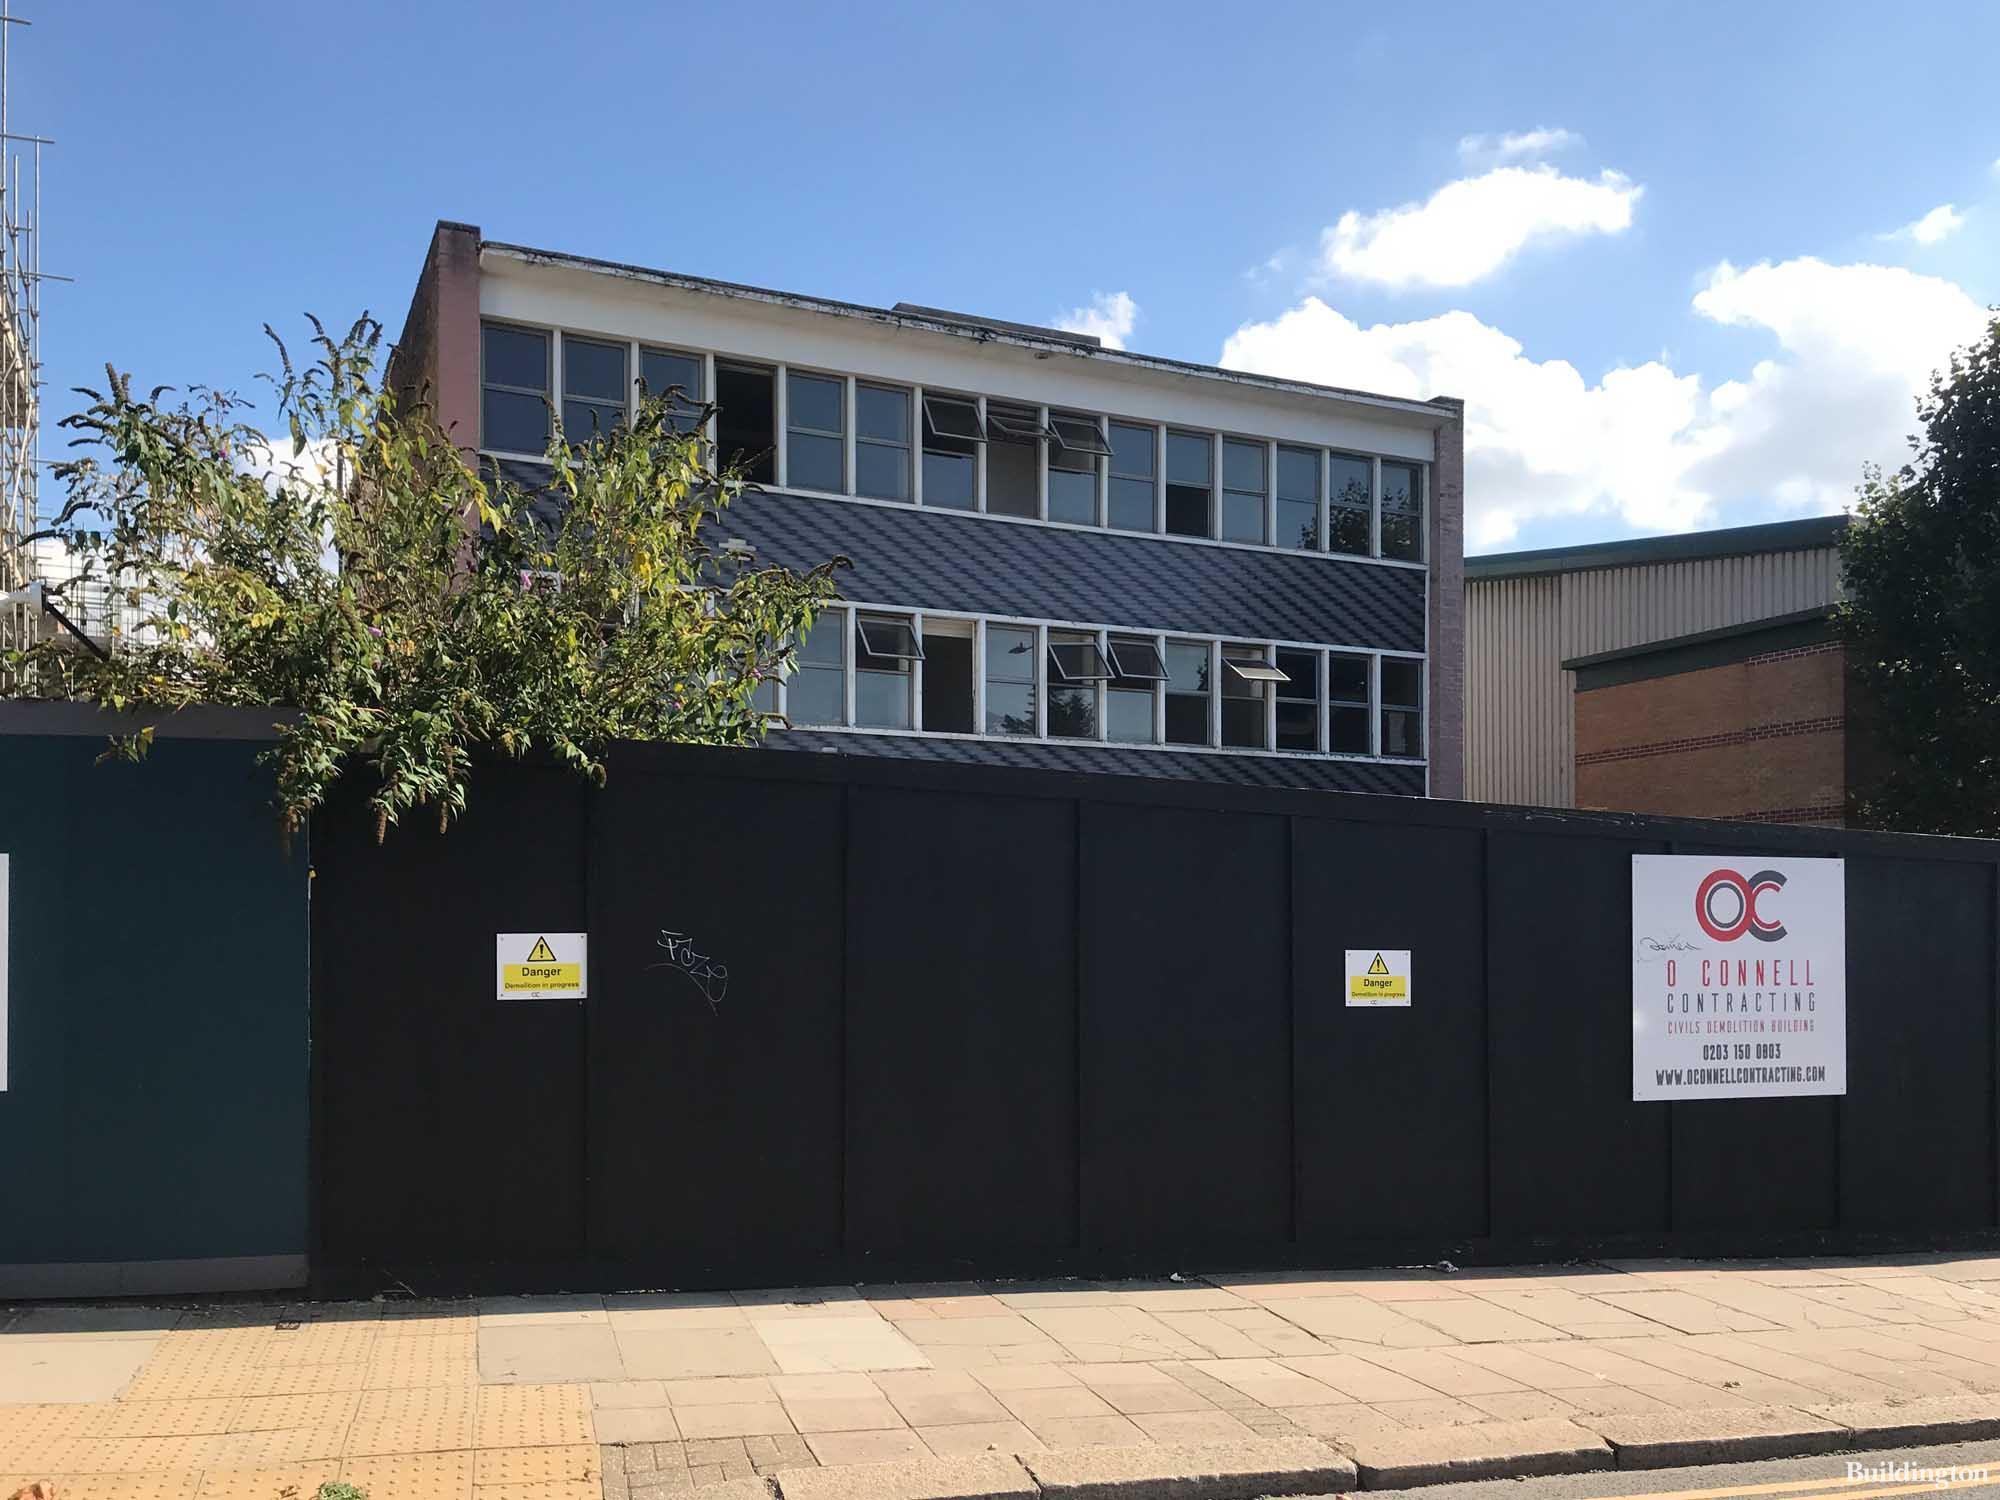 58 Neasden Lane hotel development site.